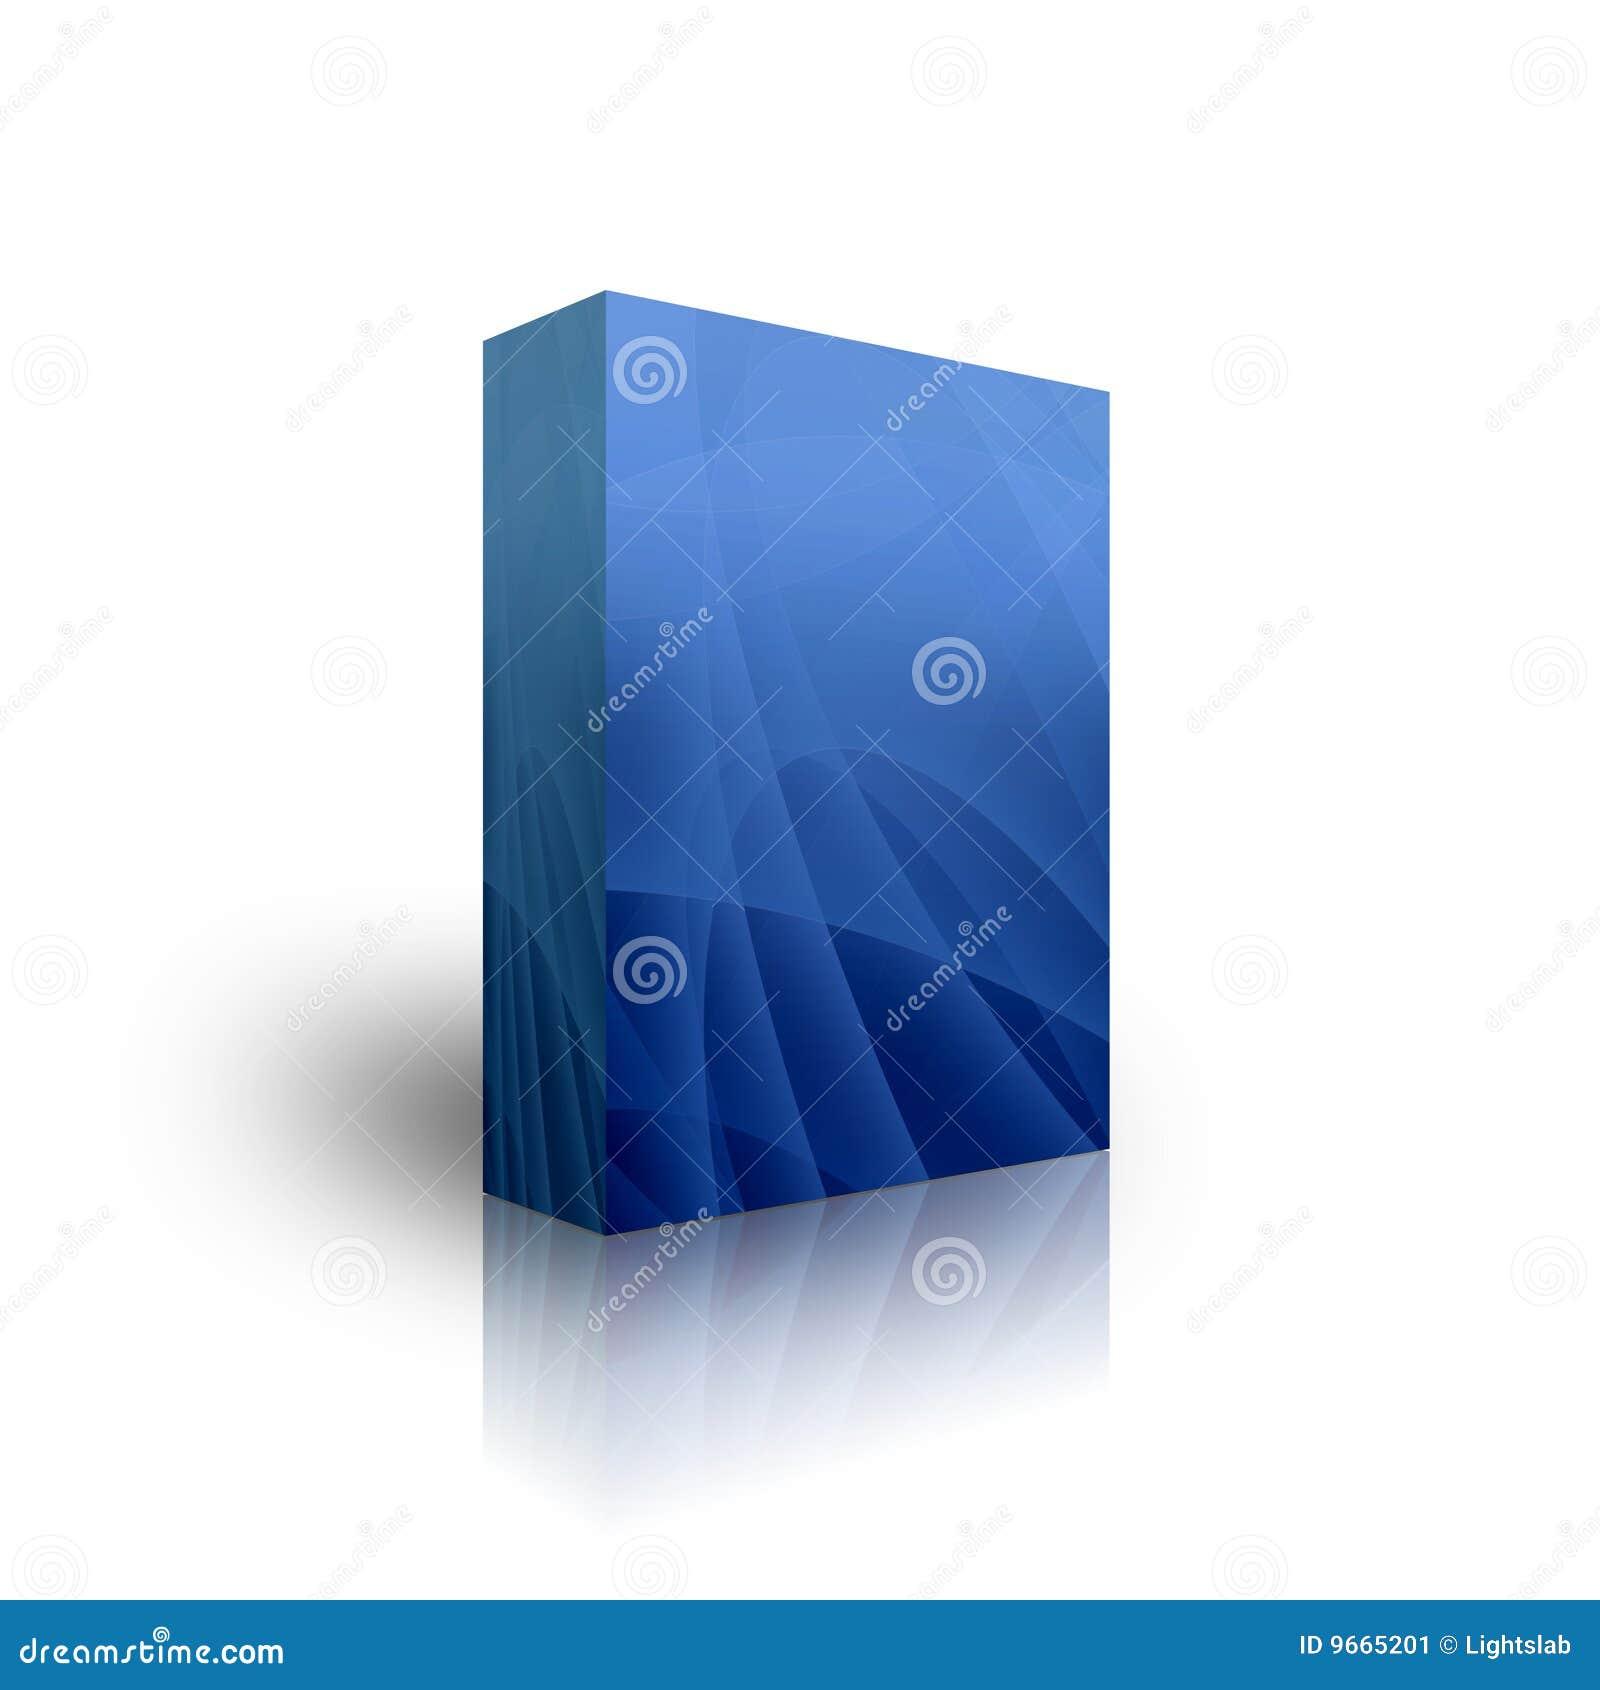 Blank Blue Box Template